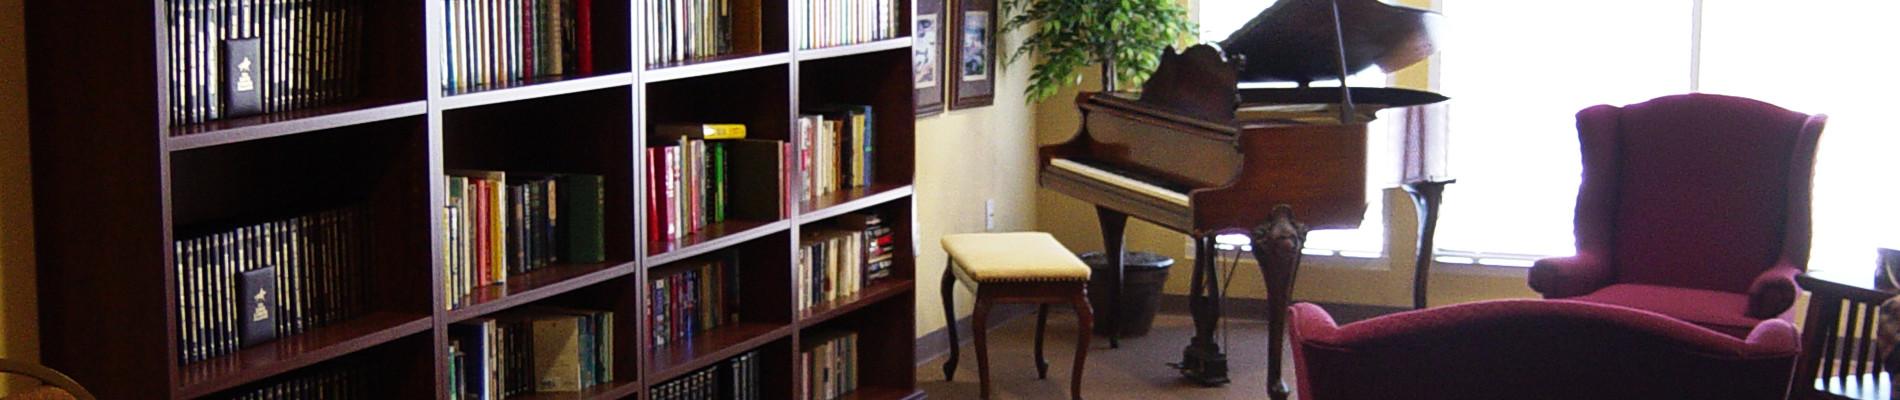 Library at Wildomar Senior Leisure Community in Temecula CA